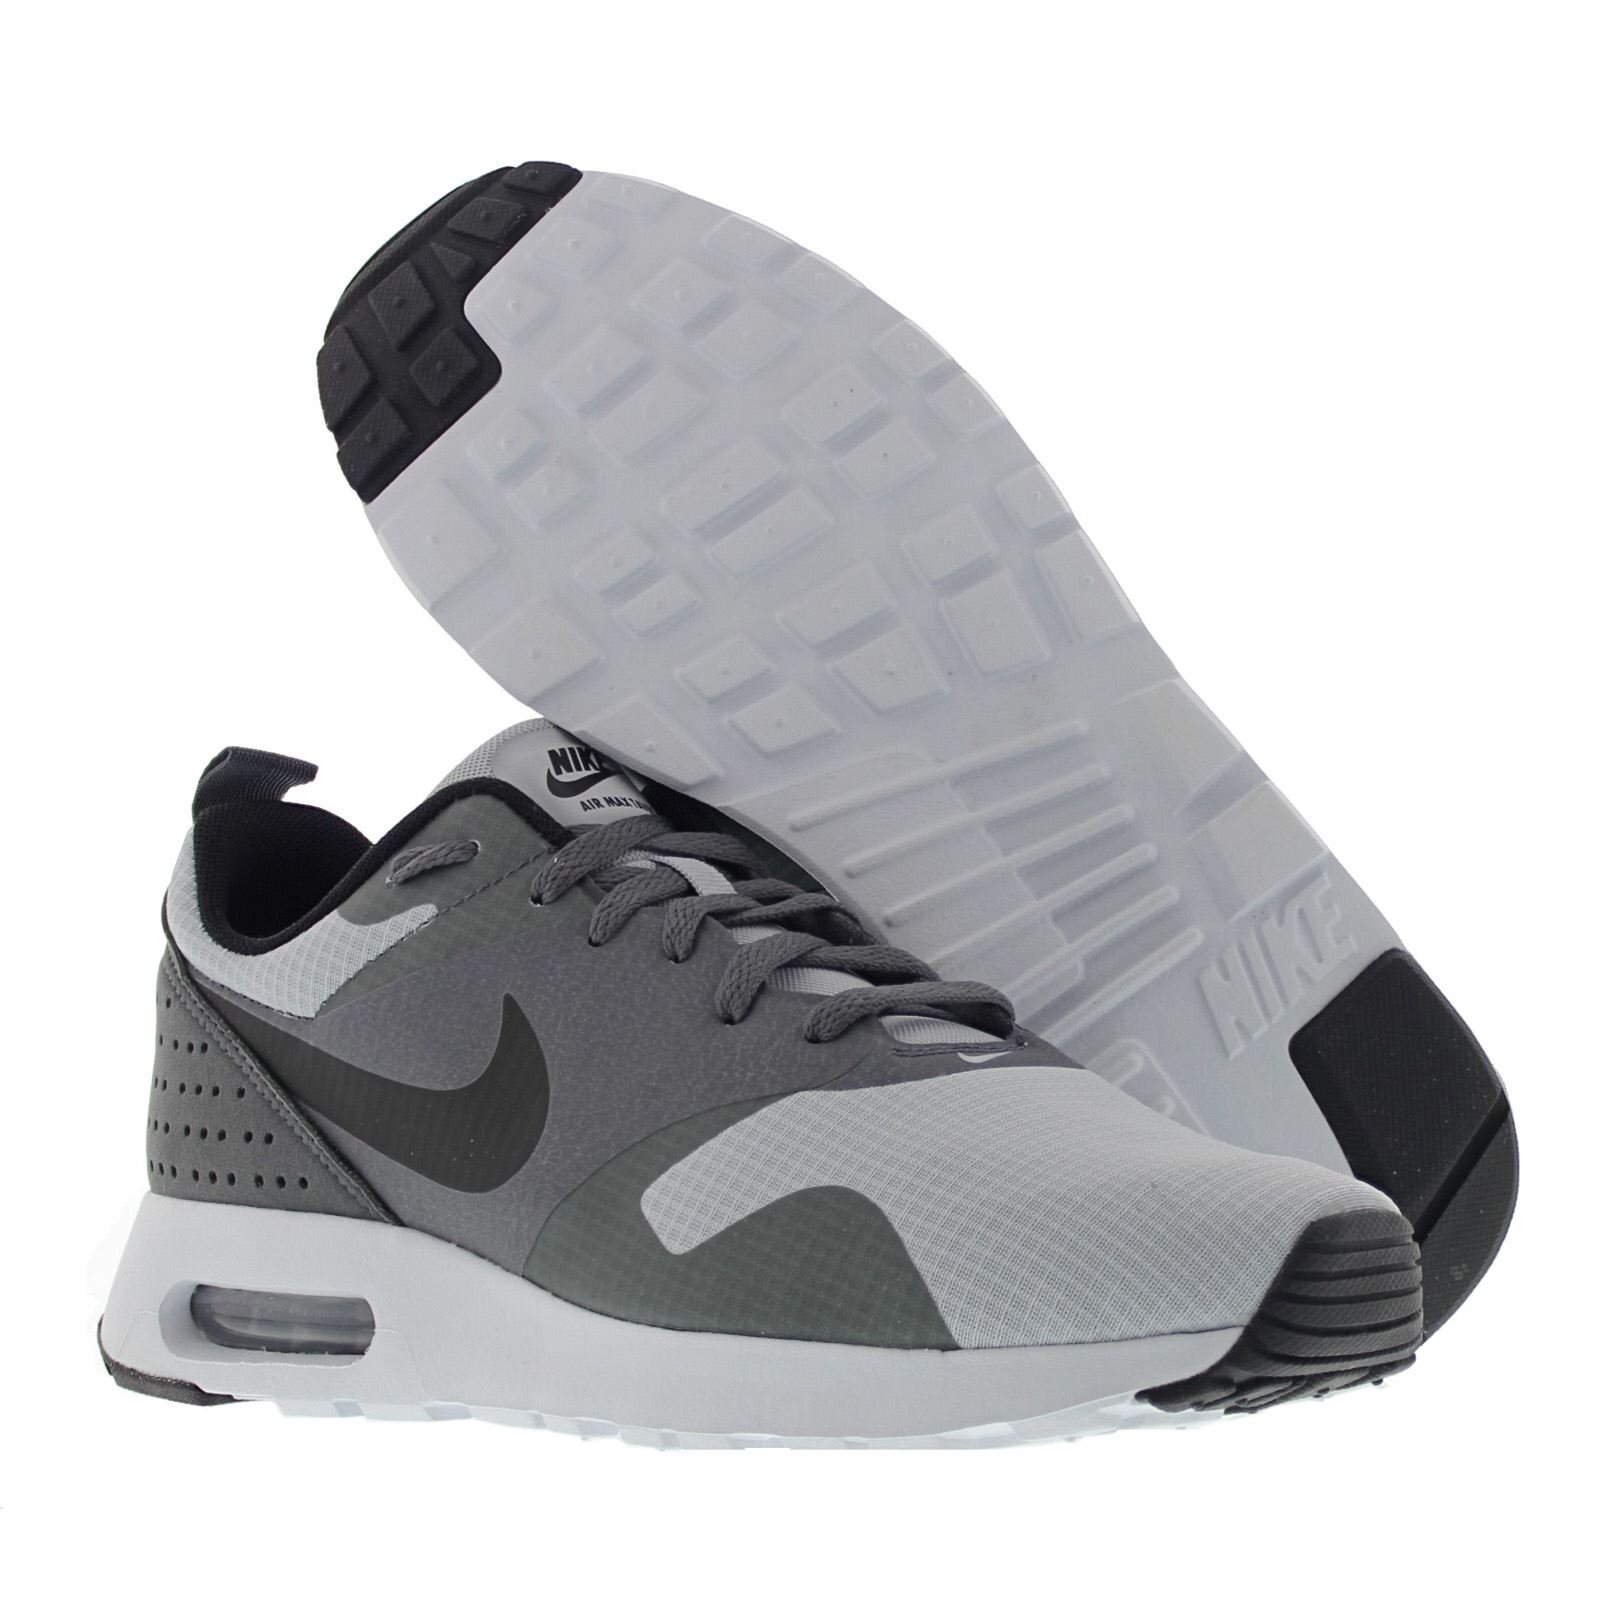 Nike Mens Air Max Tavas Grey Black Leather Trainers 42.5 EU